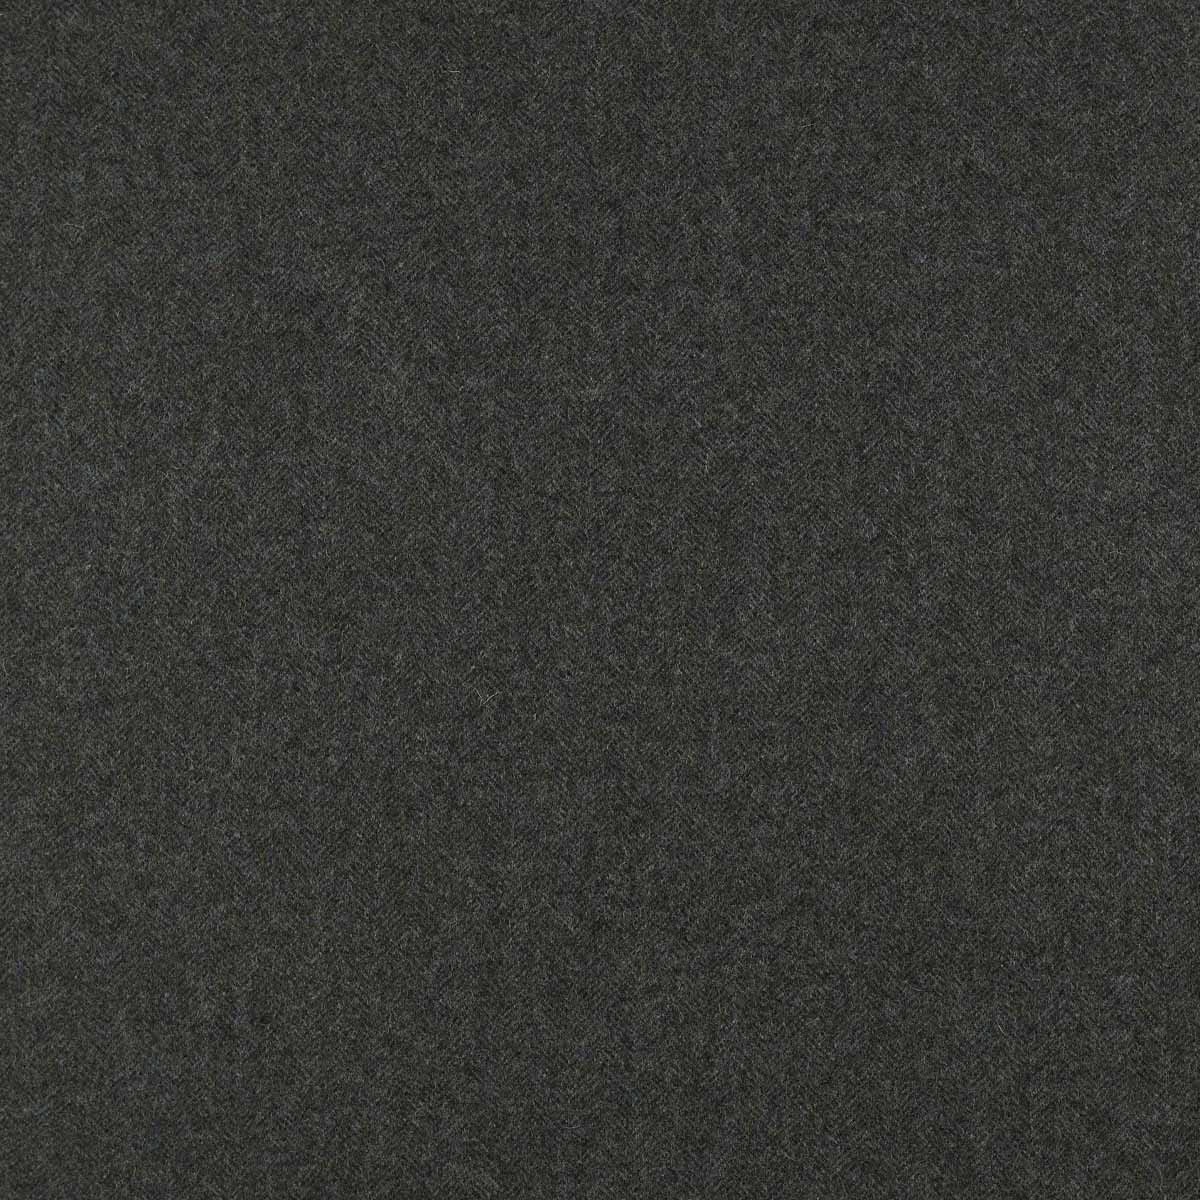 Aberdeen Sea, British Wool Tweed Fat Quarter